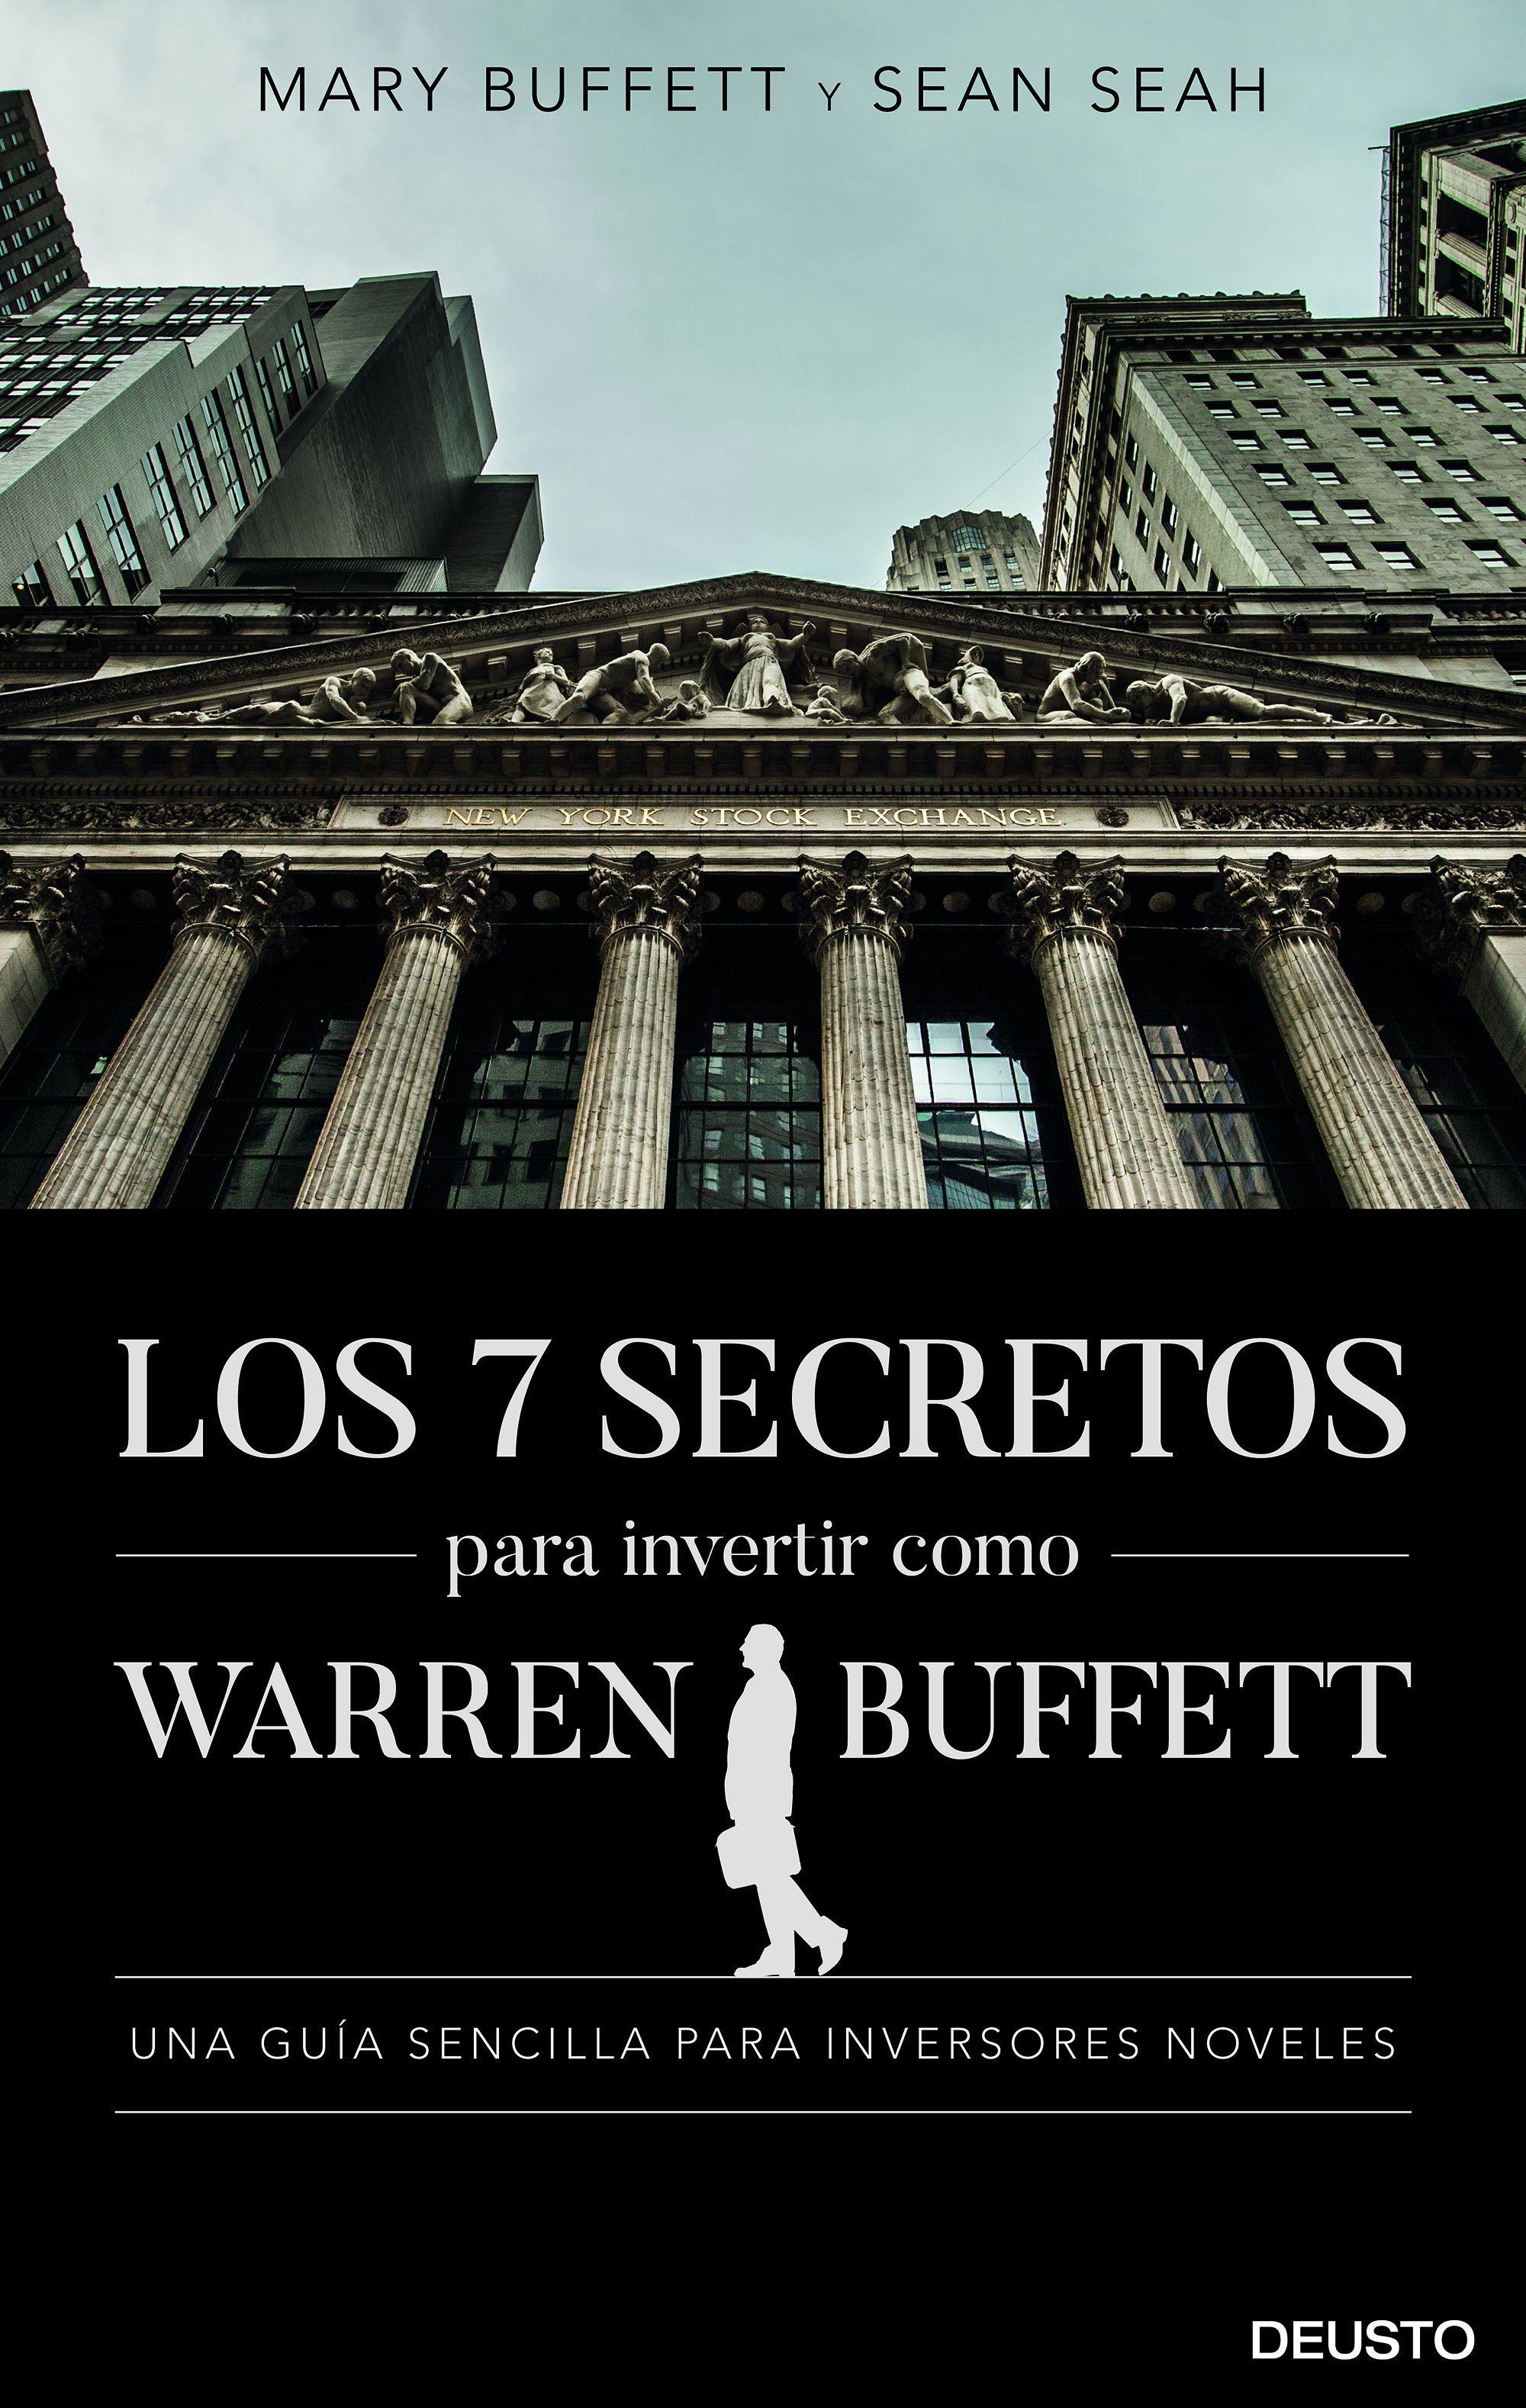 SIETE SECRETOS PARA INVERTIR COMO WARREN BUFFETT LOS